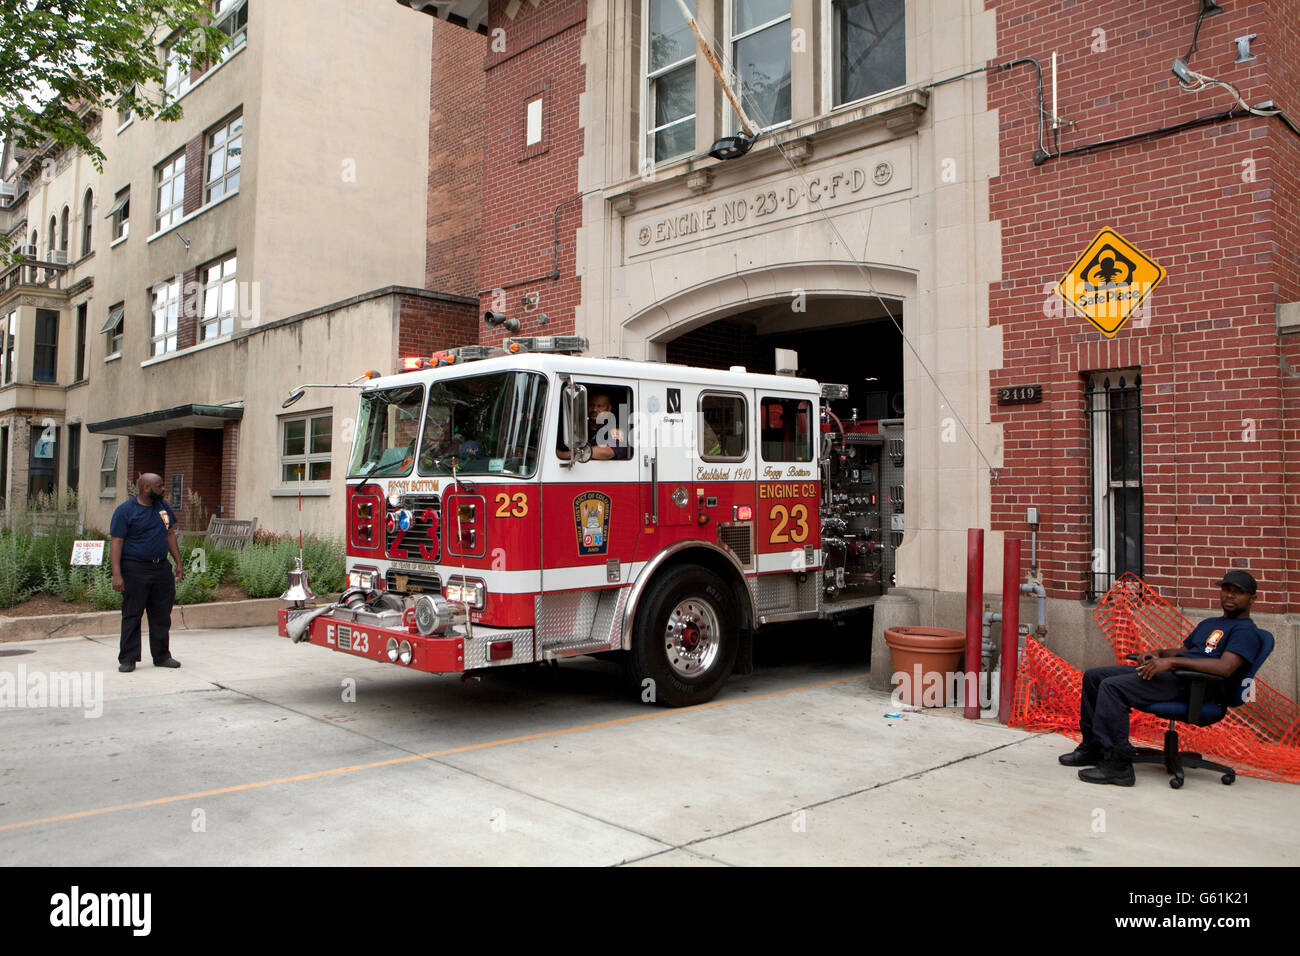 Fire truck backing into station - Washington, DC USA - Stock Image